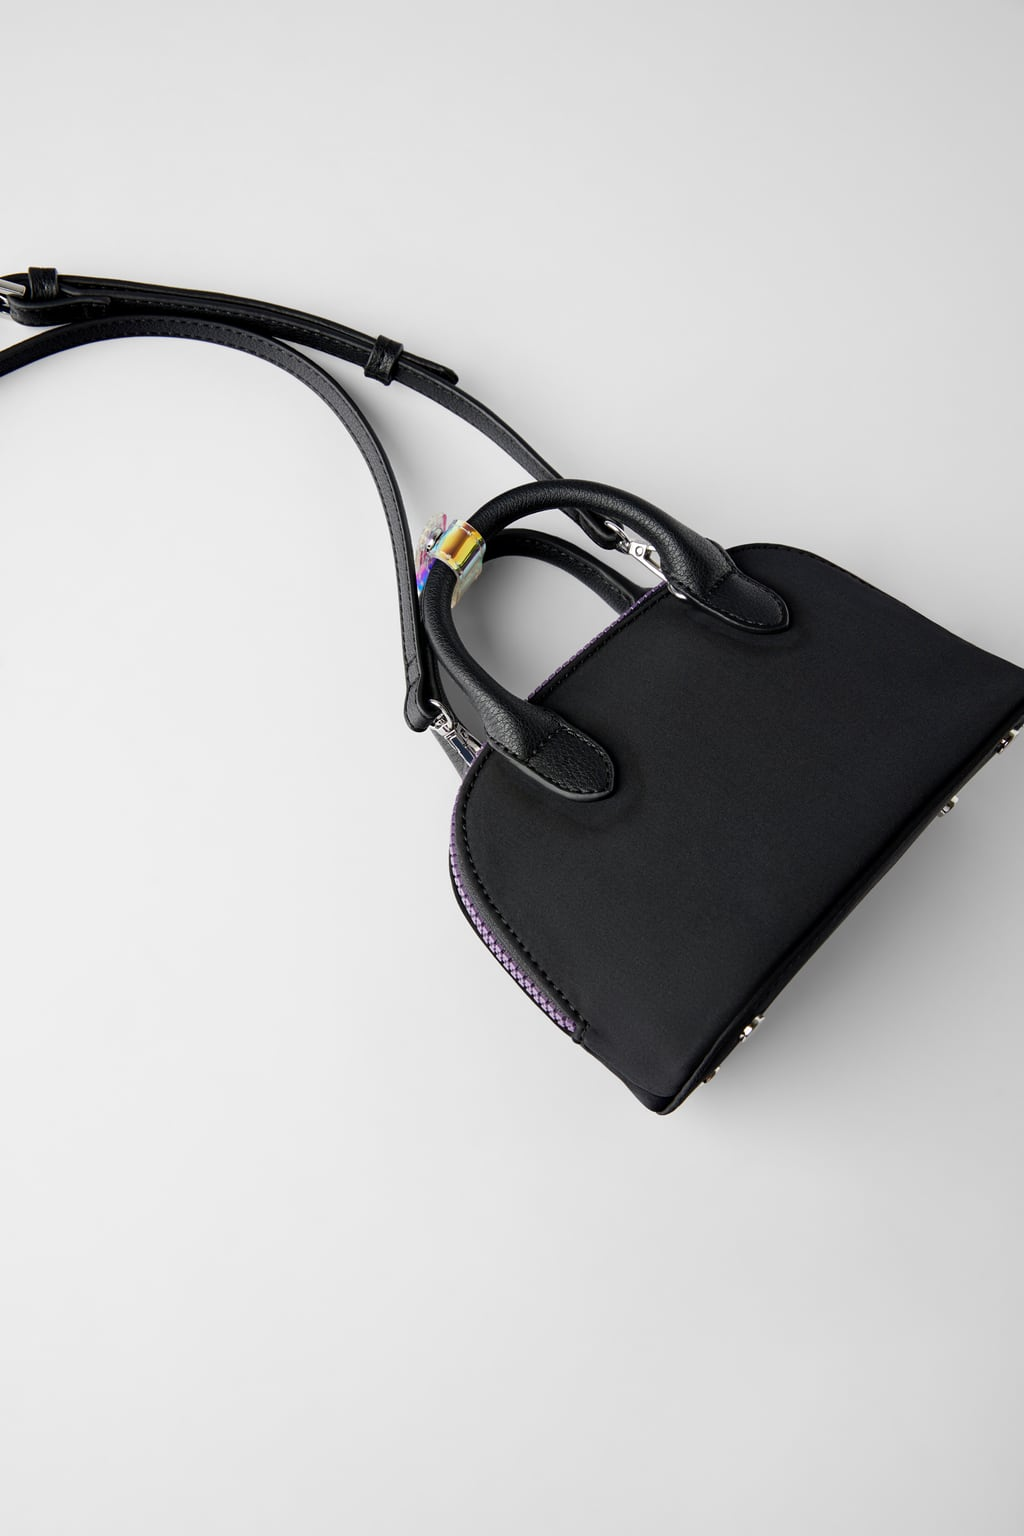 Zara mini-bag